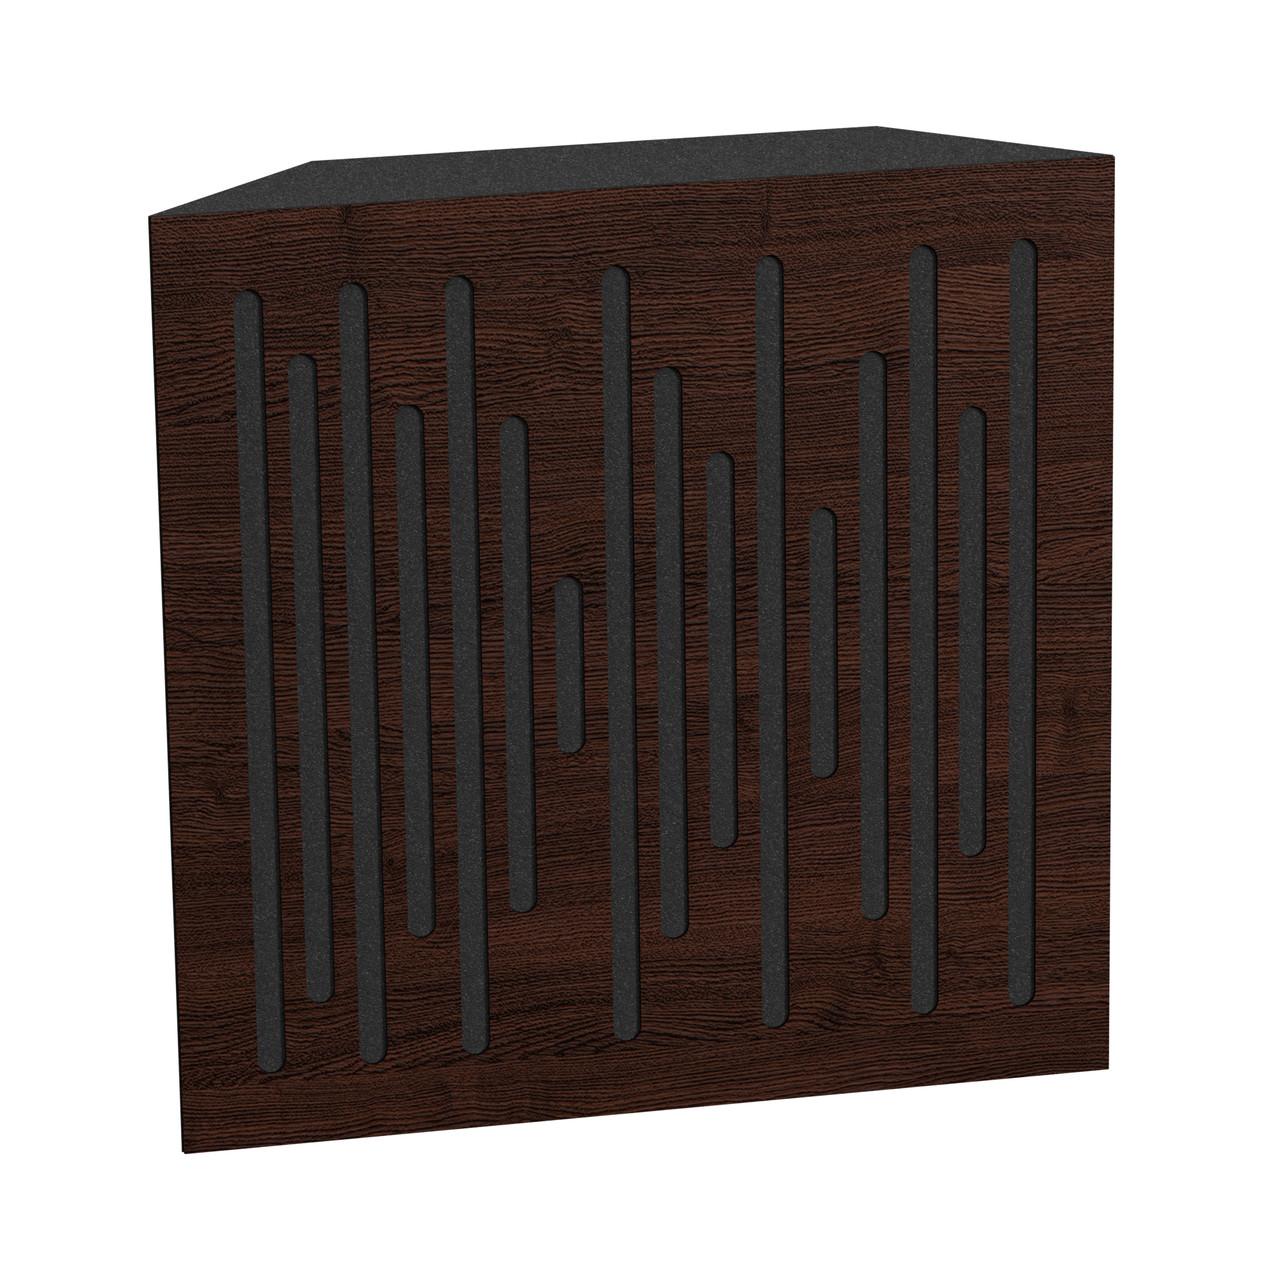 Бас пастка Ecosound Bass trap Ecowave wood 500х500х100 колір венге